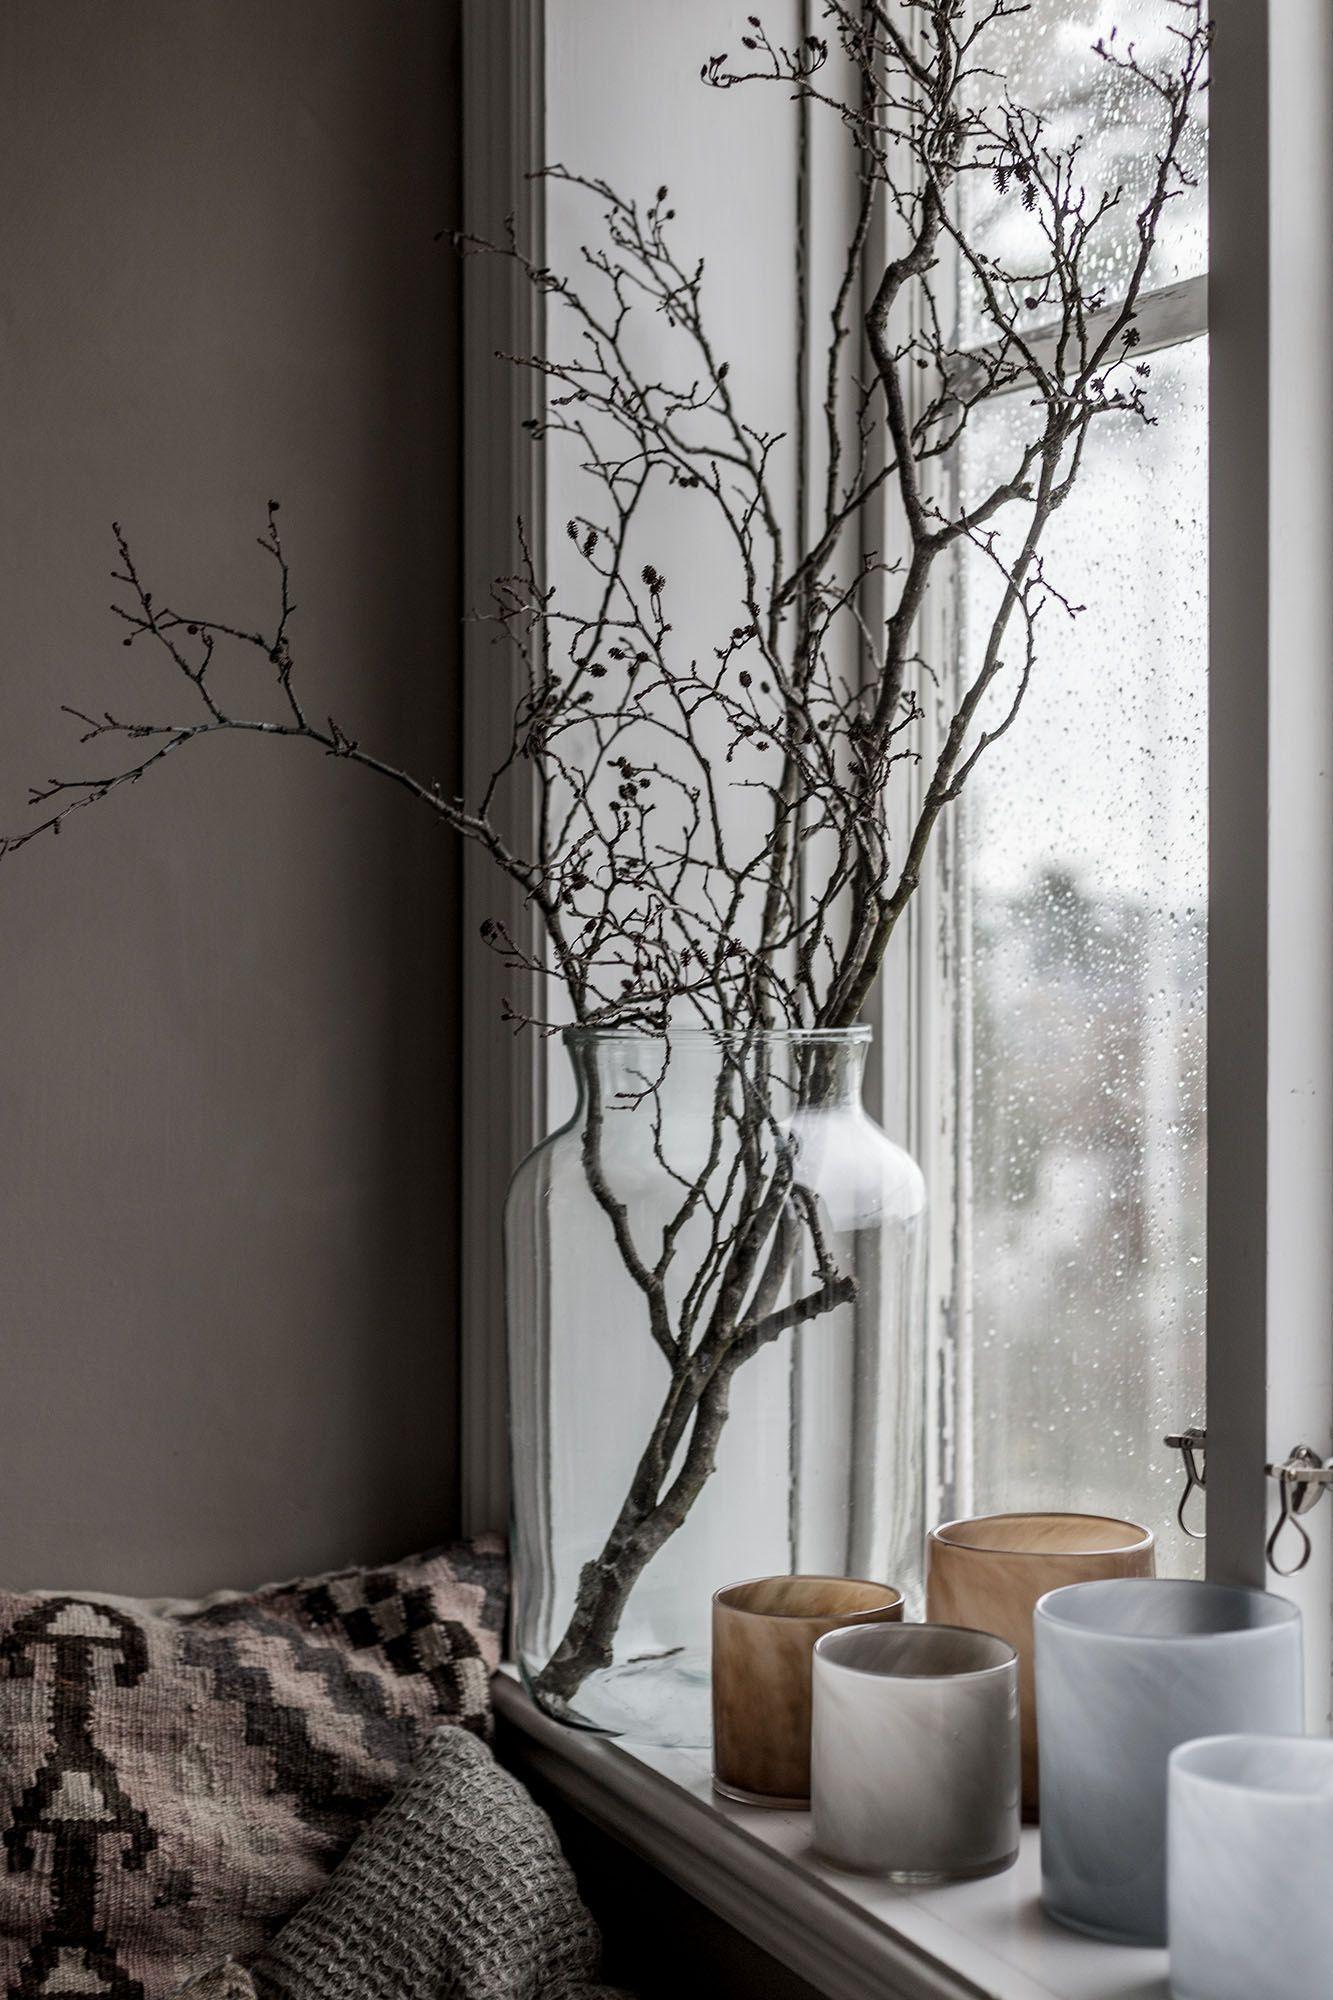 Pin de Janet N. en someday home ❁ | Pinterest | Decoración